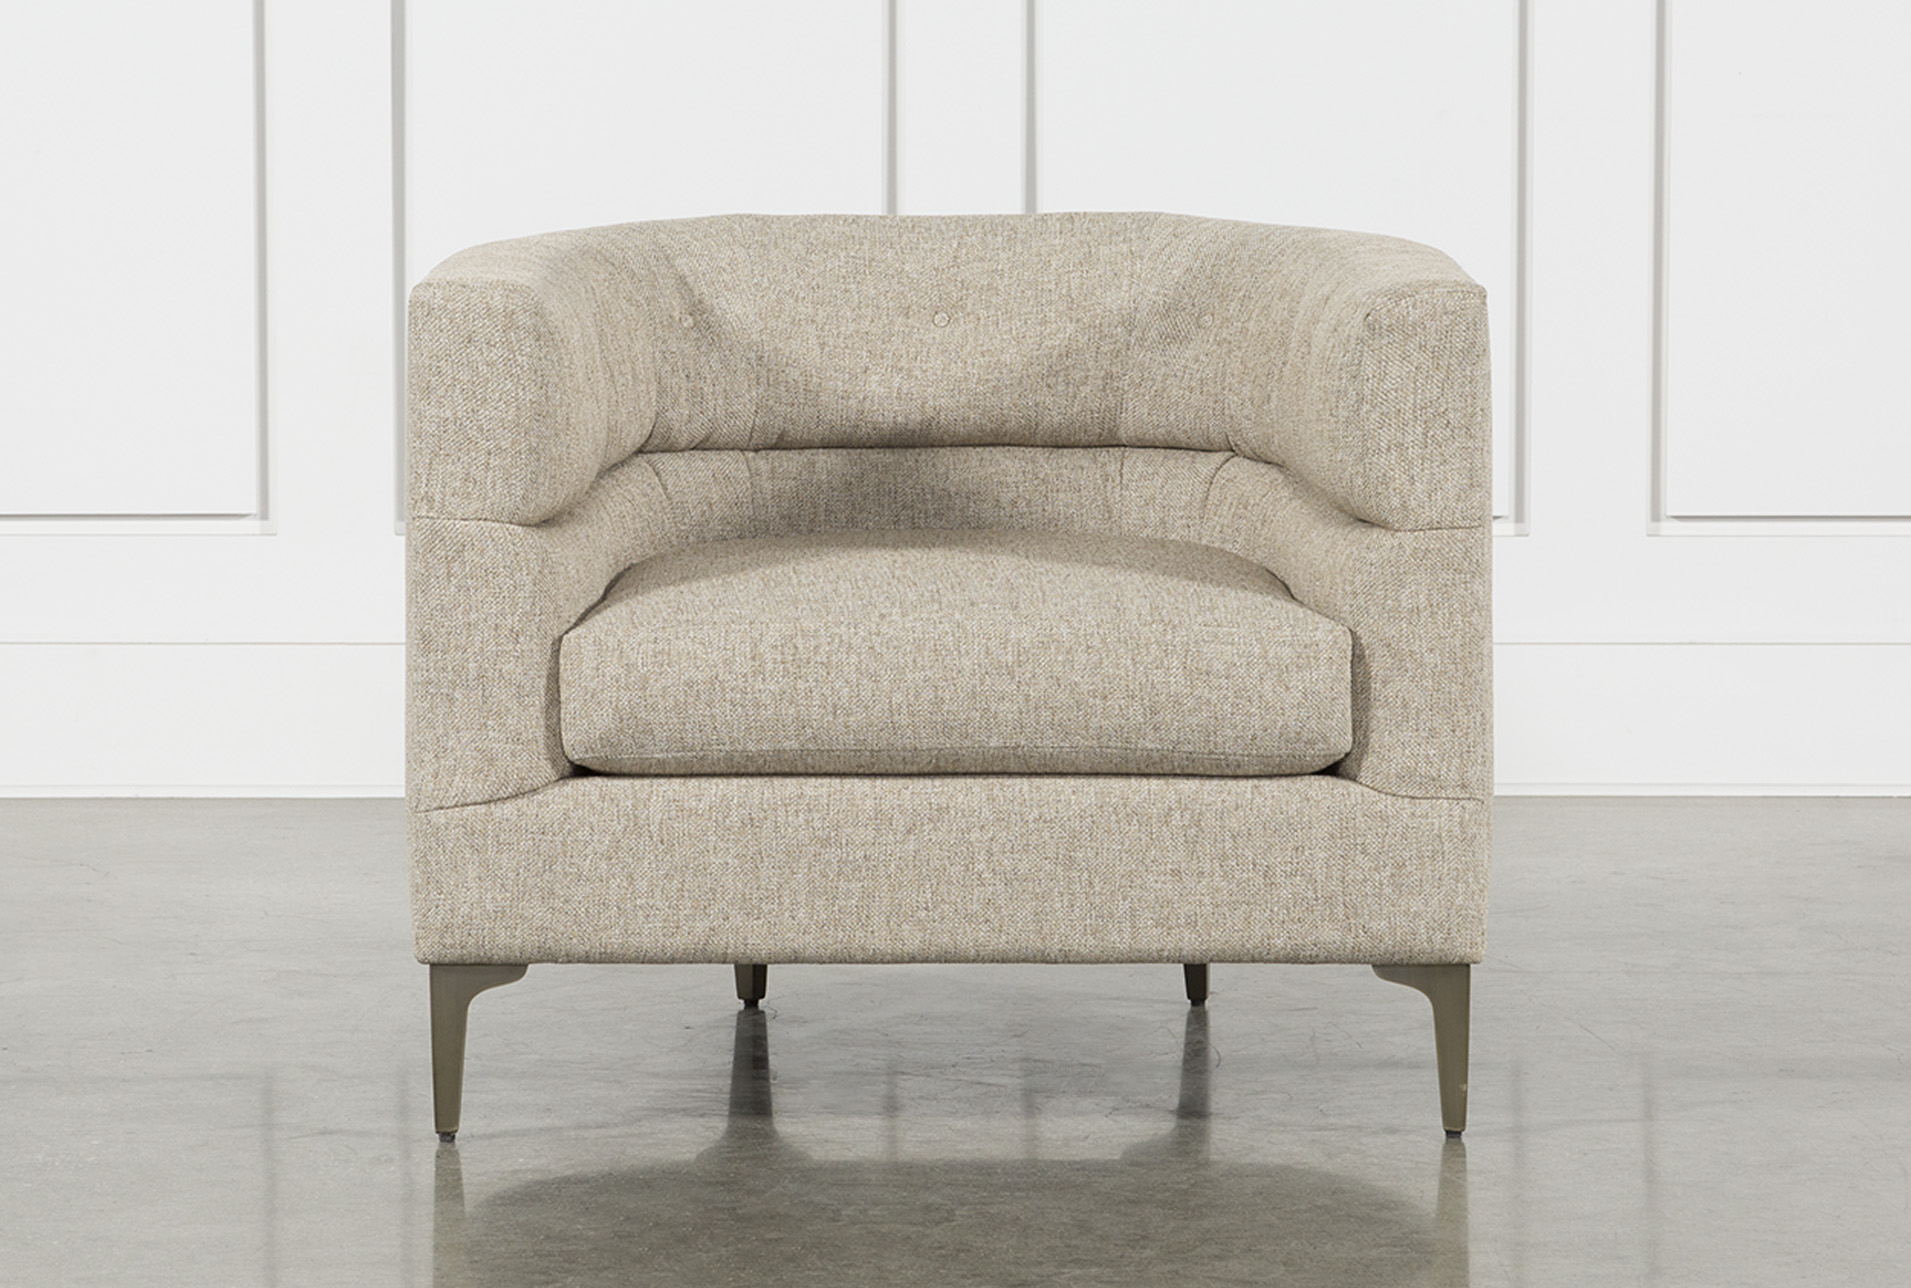 Matteo Arm Chairnate Berkus And Jeremiah Brent In 2018 For Liv Arm Sofa Chairs By Nate Berkus And Jeremiah Brent (View 4 of 20)